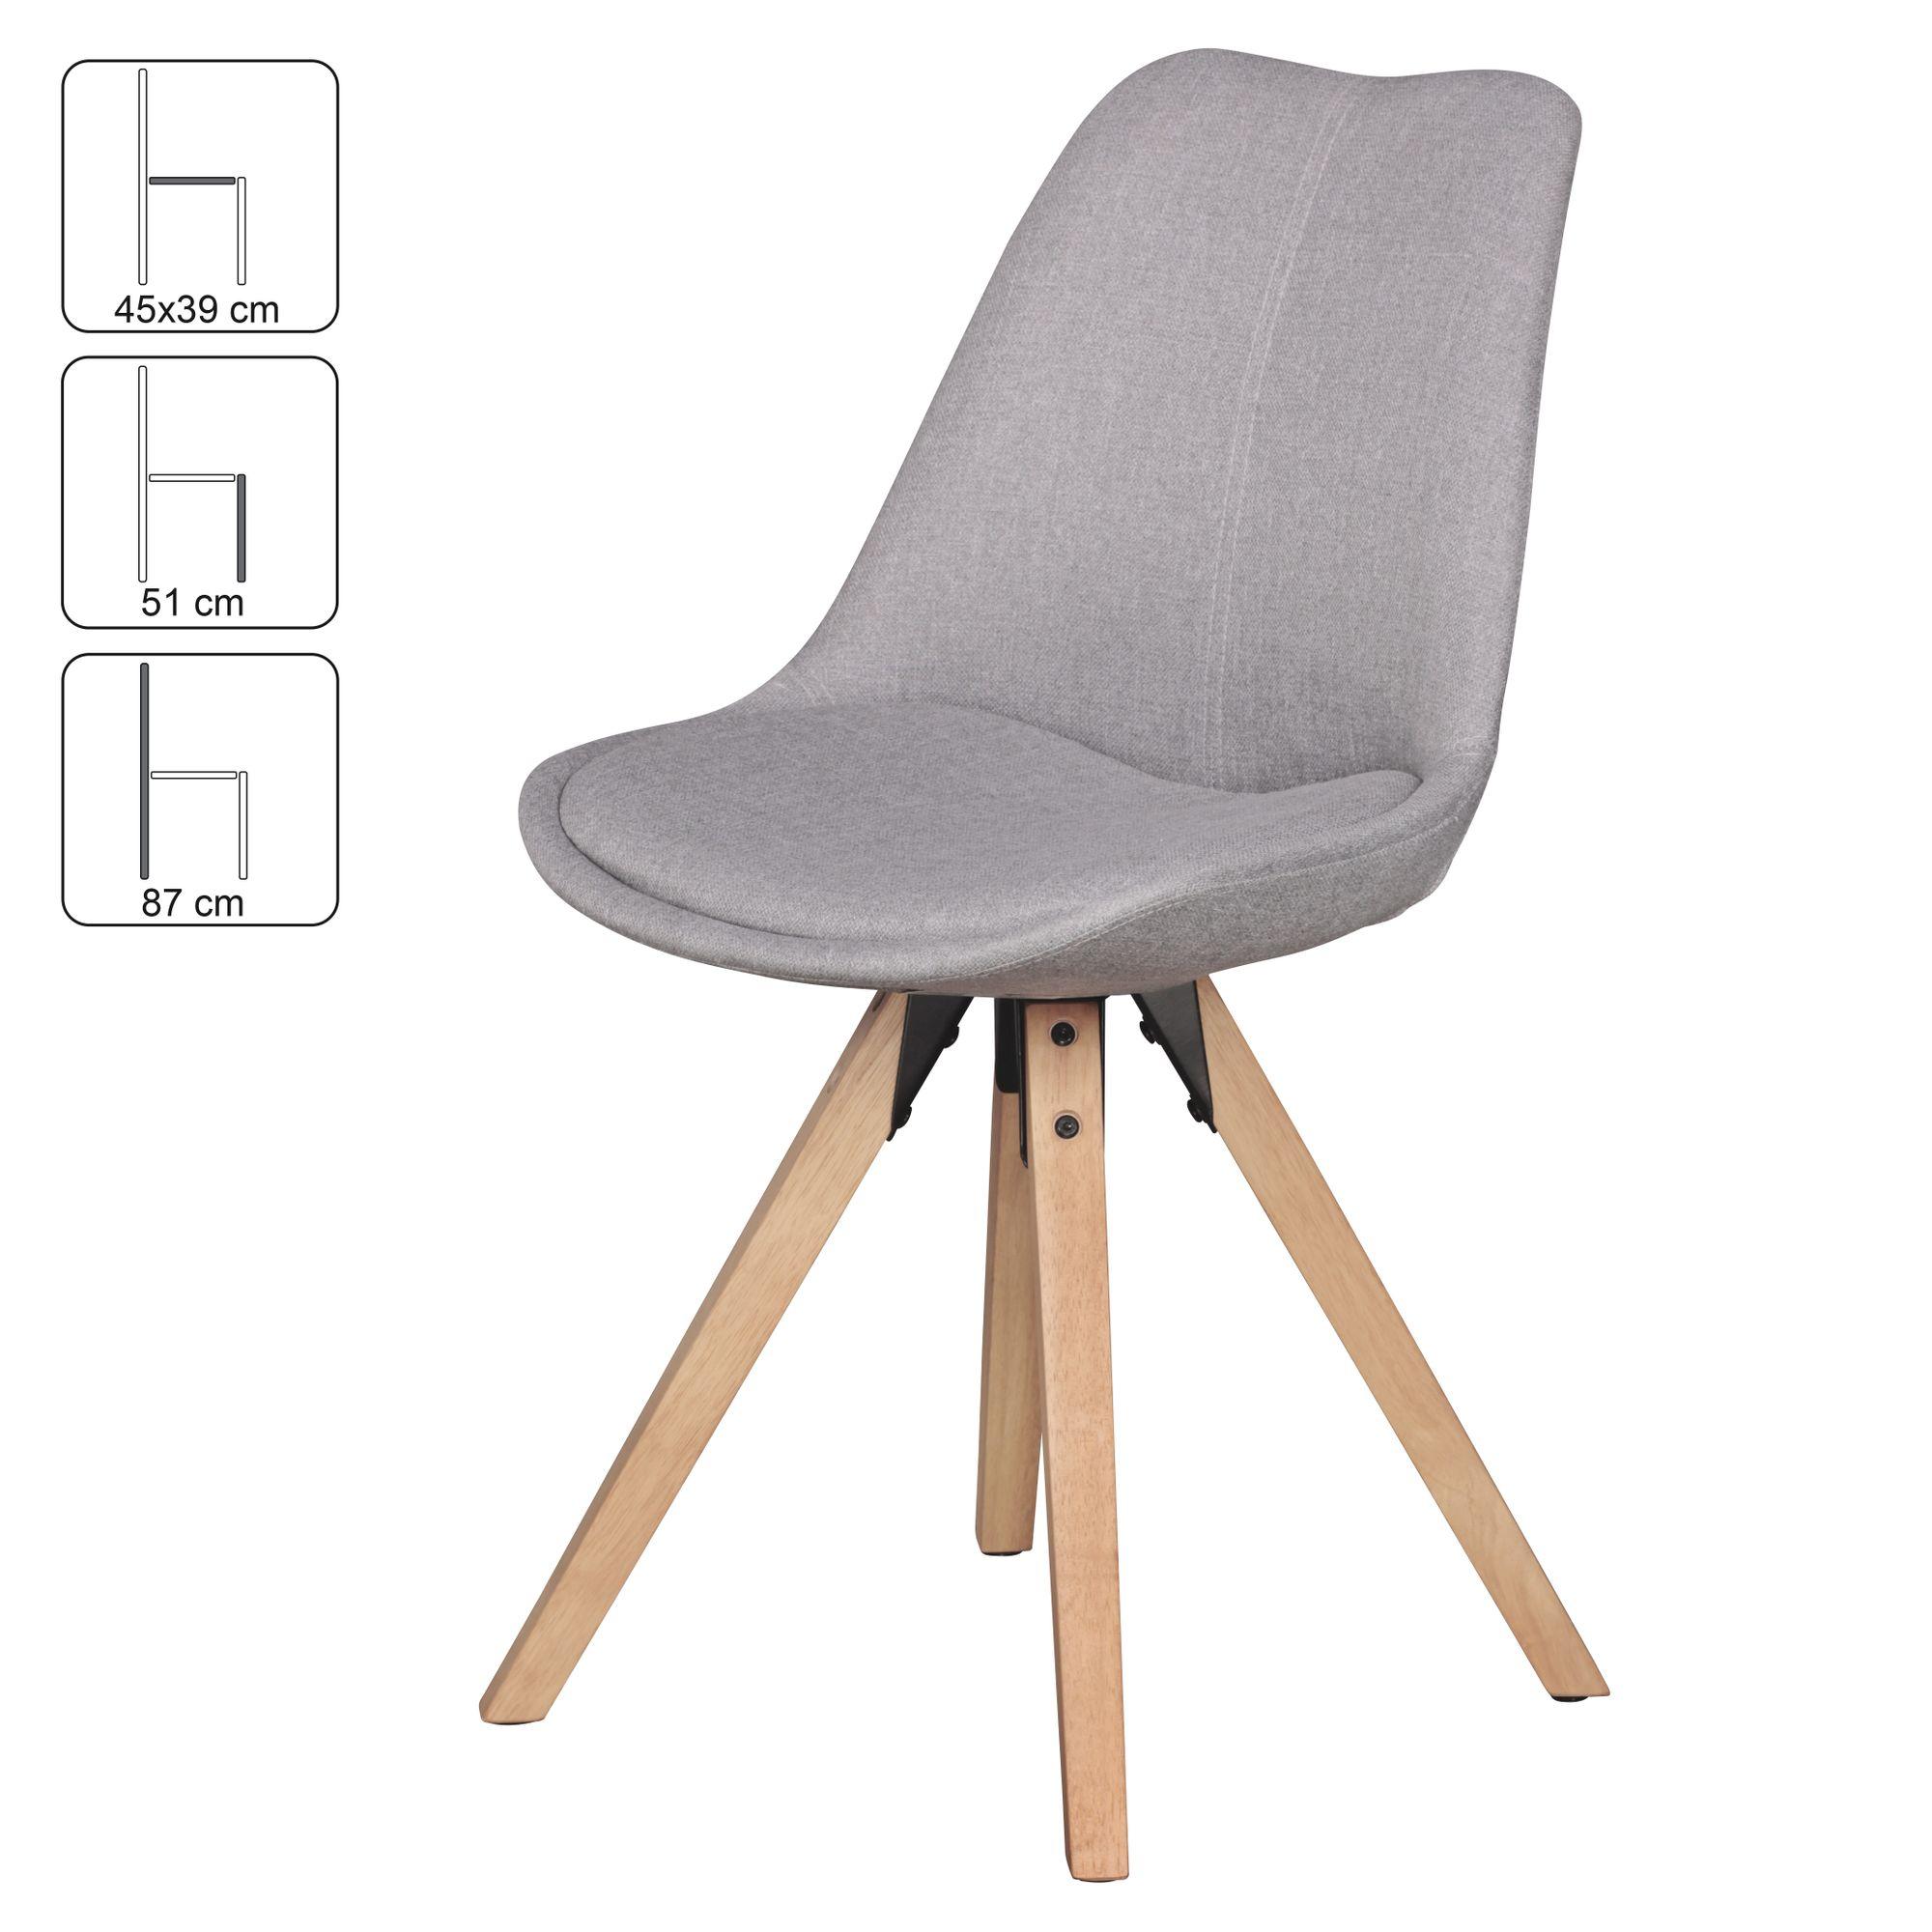 Finebuy Design Esszimmerstuhle 2er Set Sv43580 Skandinavische Stuhle Mit Holzbeinen Retro Stuhlset Bunt Kuchenstuhle